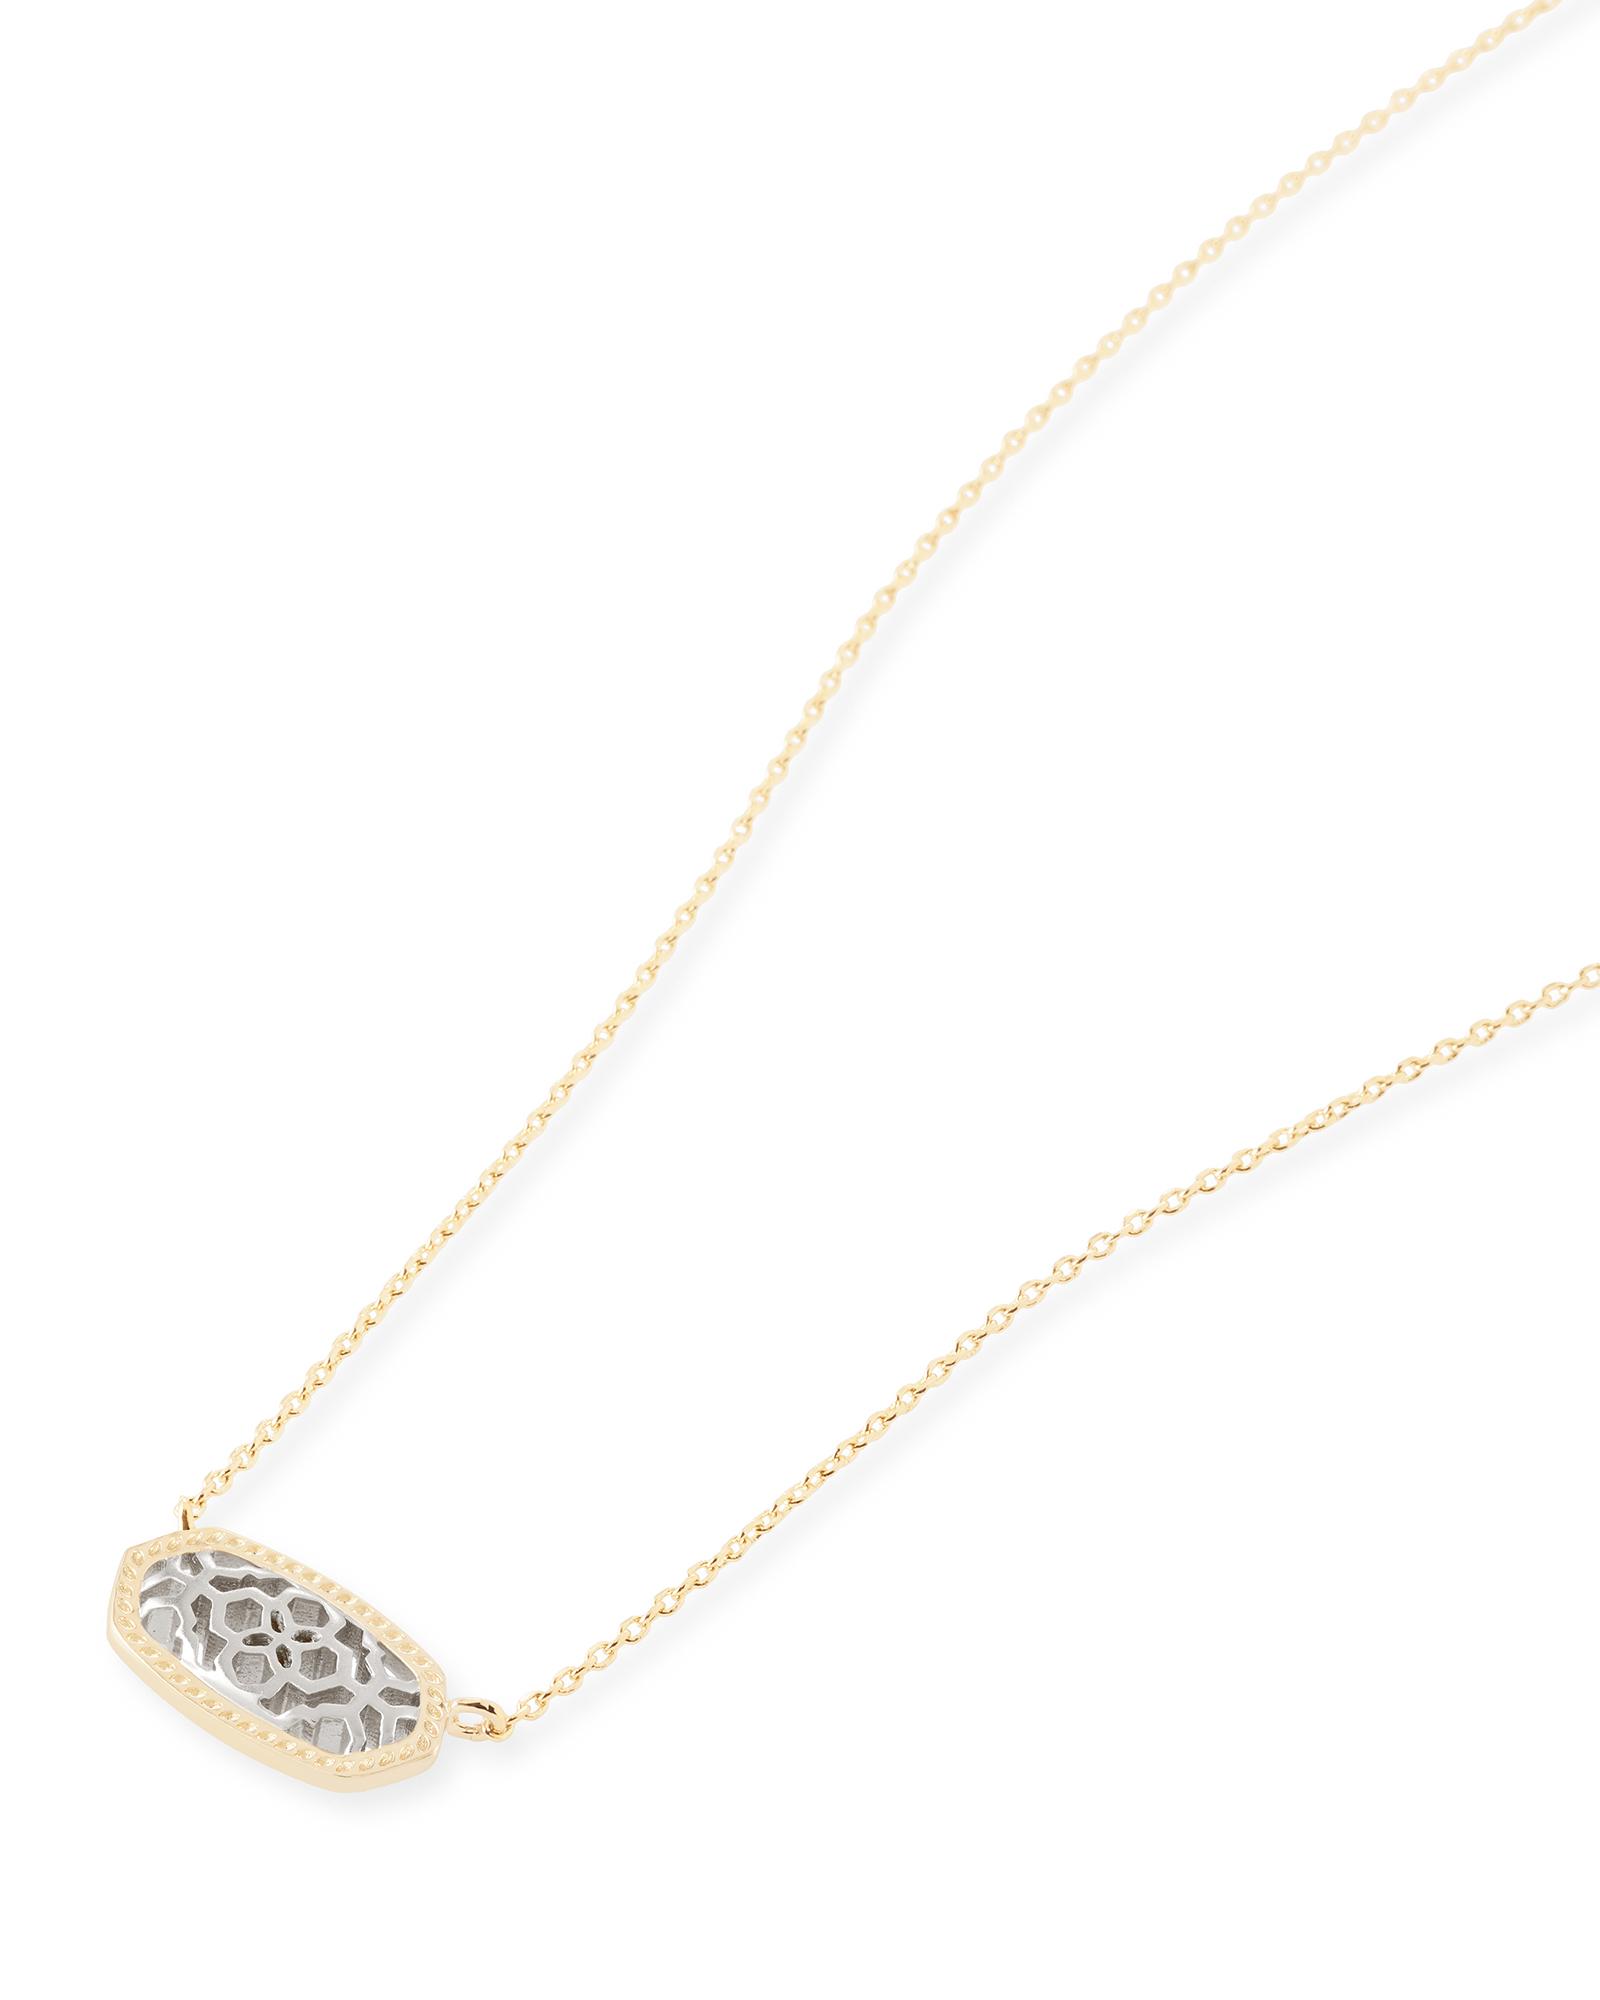 ac8298fc9fd Kendra Scott Elisa Necklace | Products | Jewelry, Pendant necklace ...